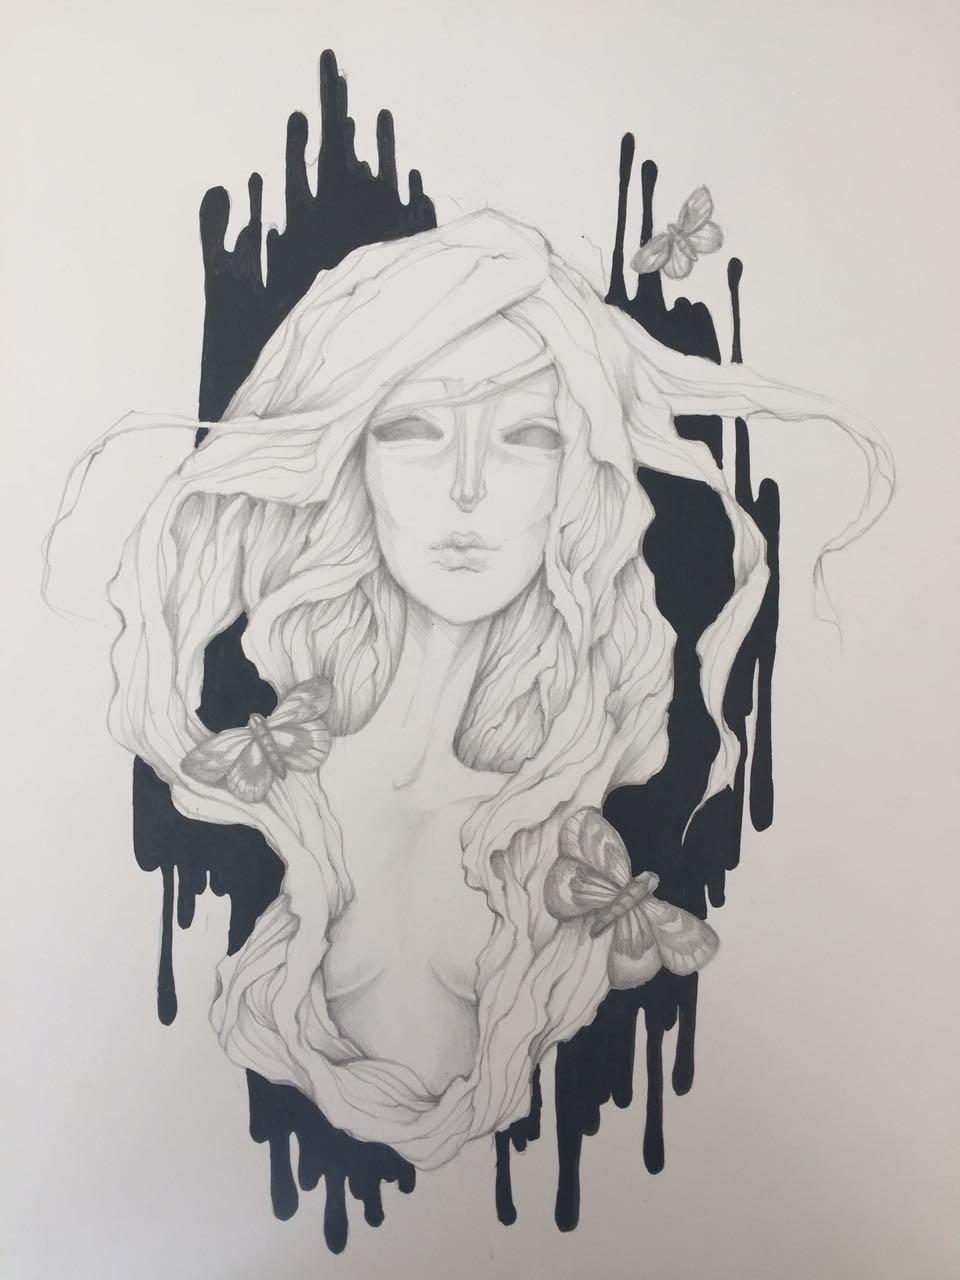 "Judul :""Moth"" Artis : Ica Medium :Graphite drawing + acryllic on paper"